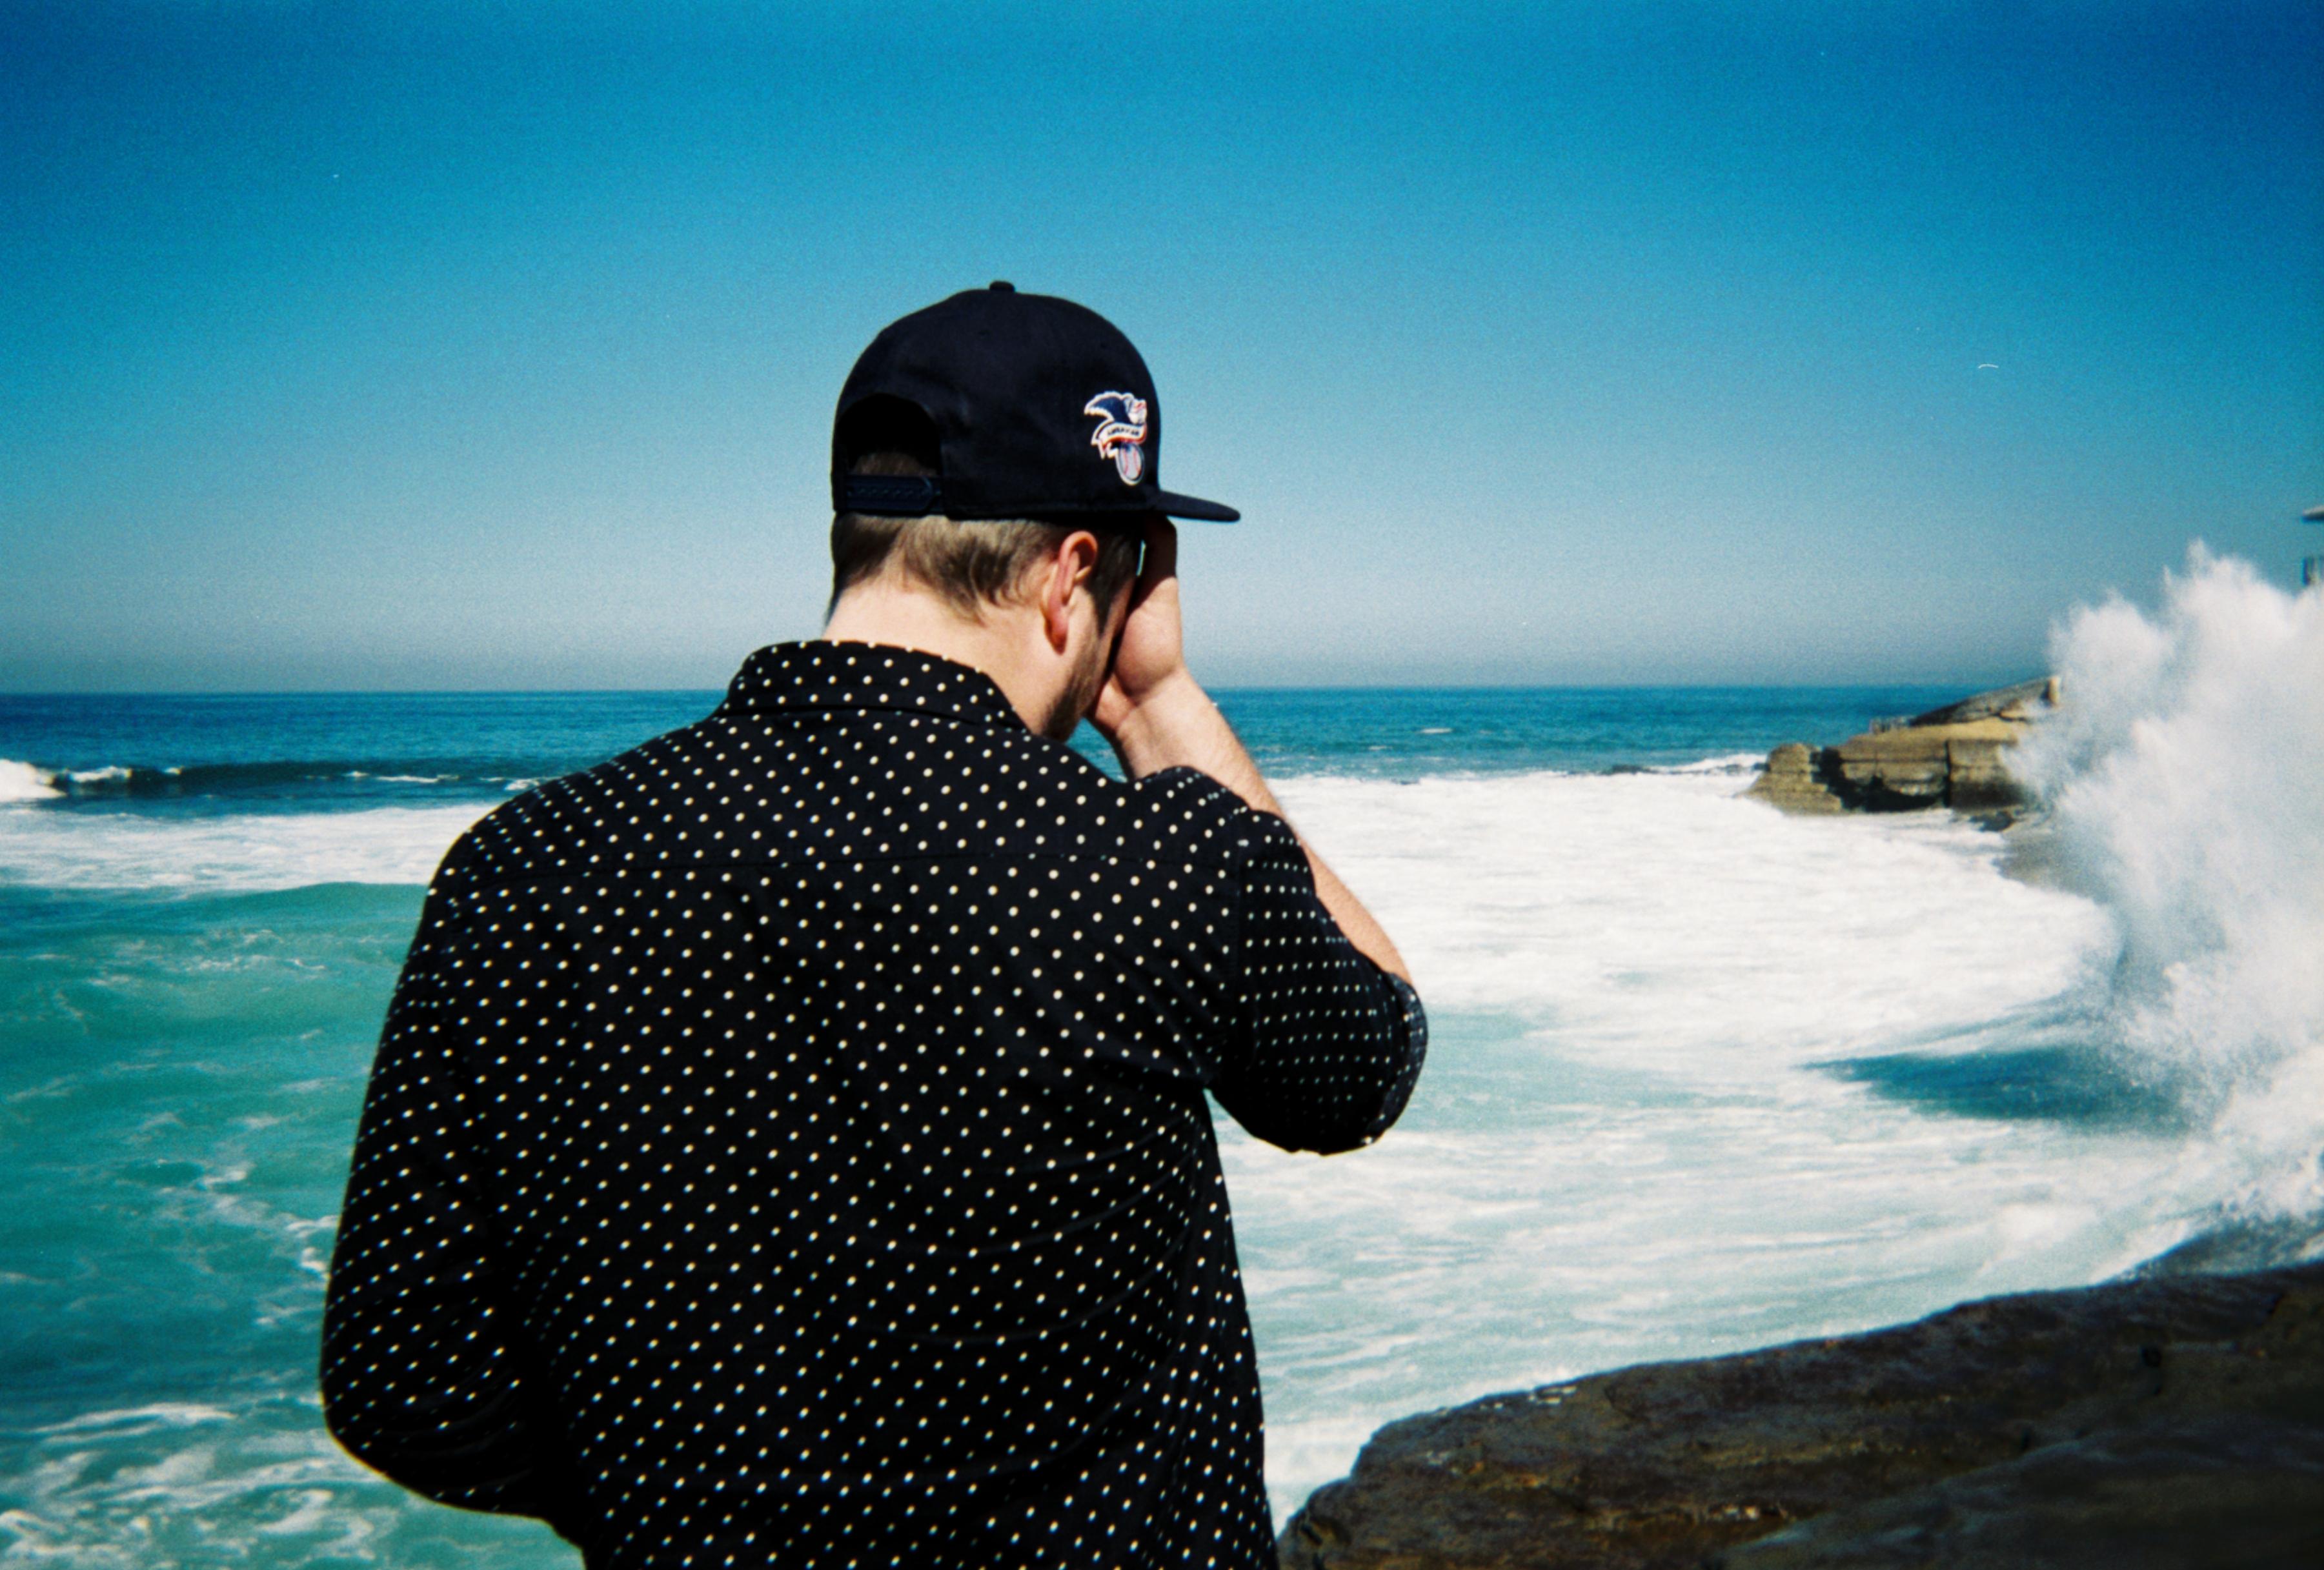 Lucas, La Jolla, CA